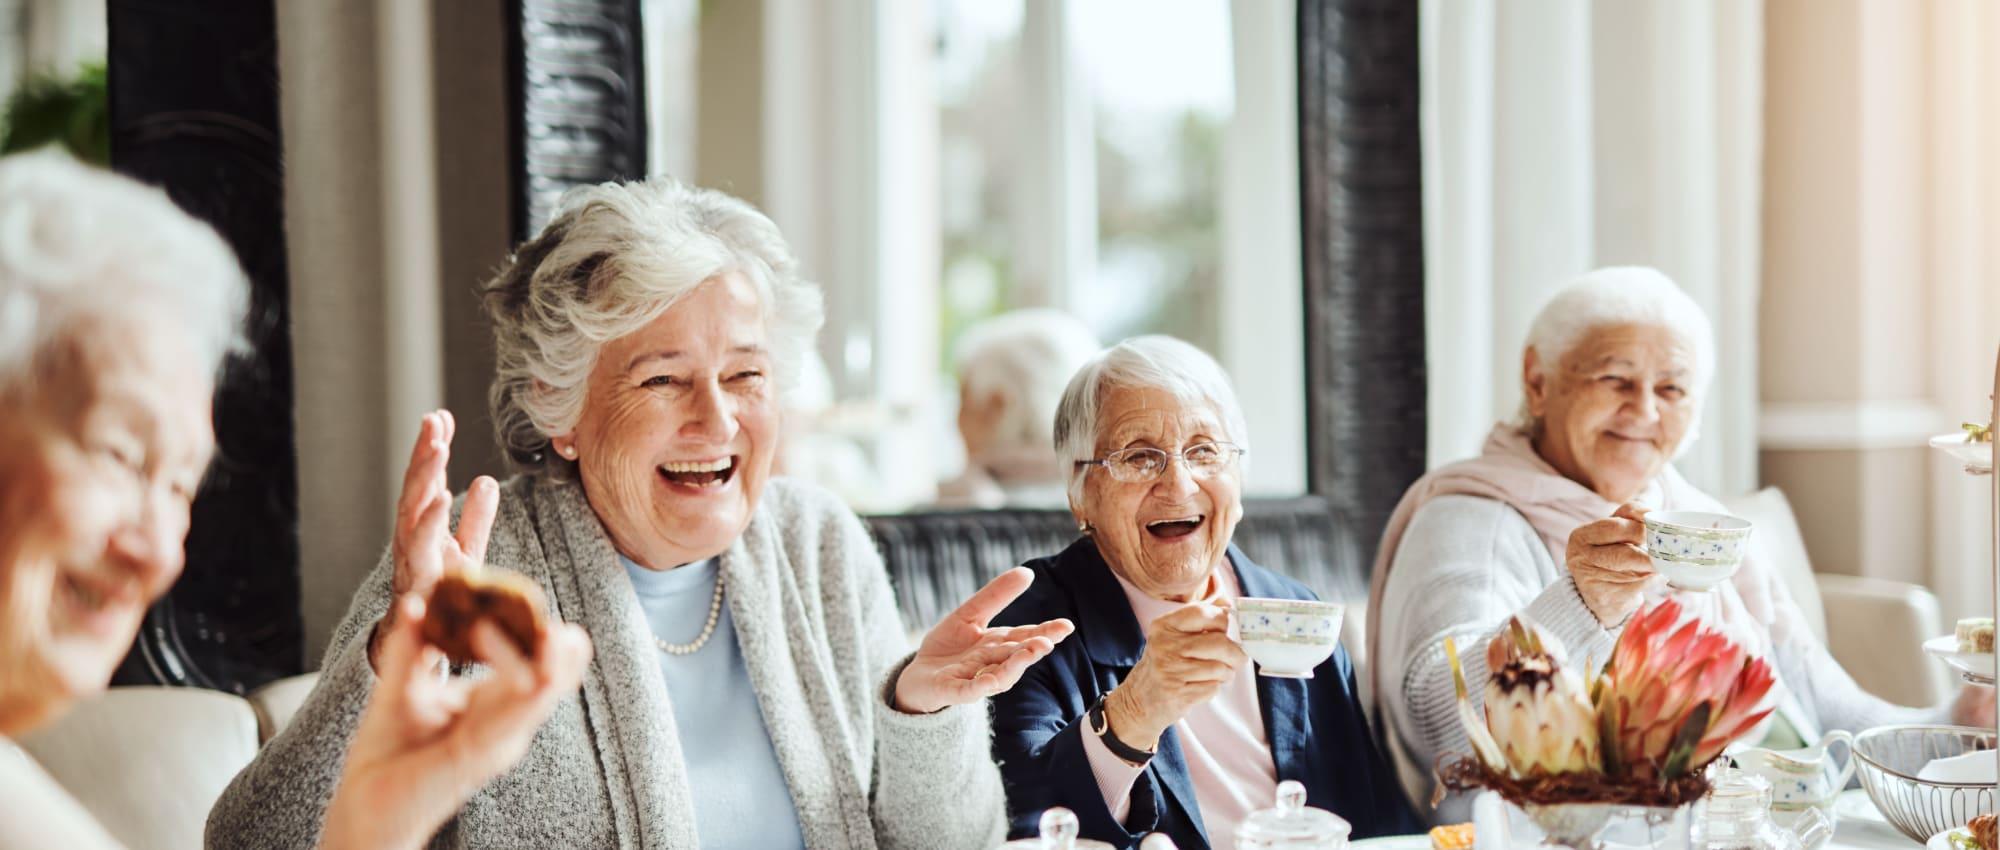 Services and amenities at Milestone Senior Living in Faribault, Minnesota.